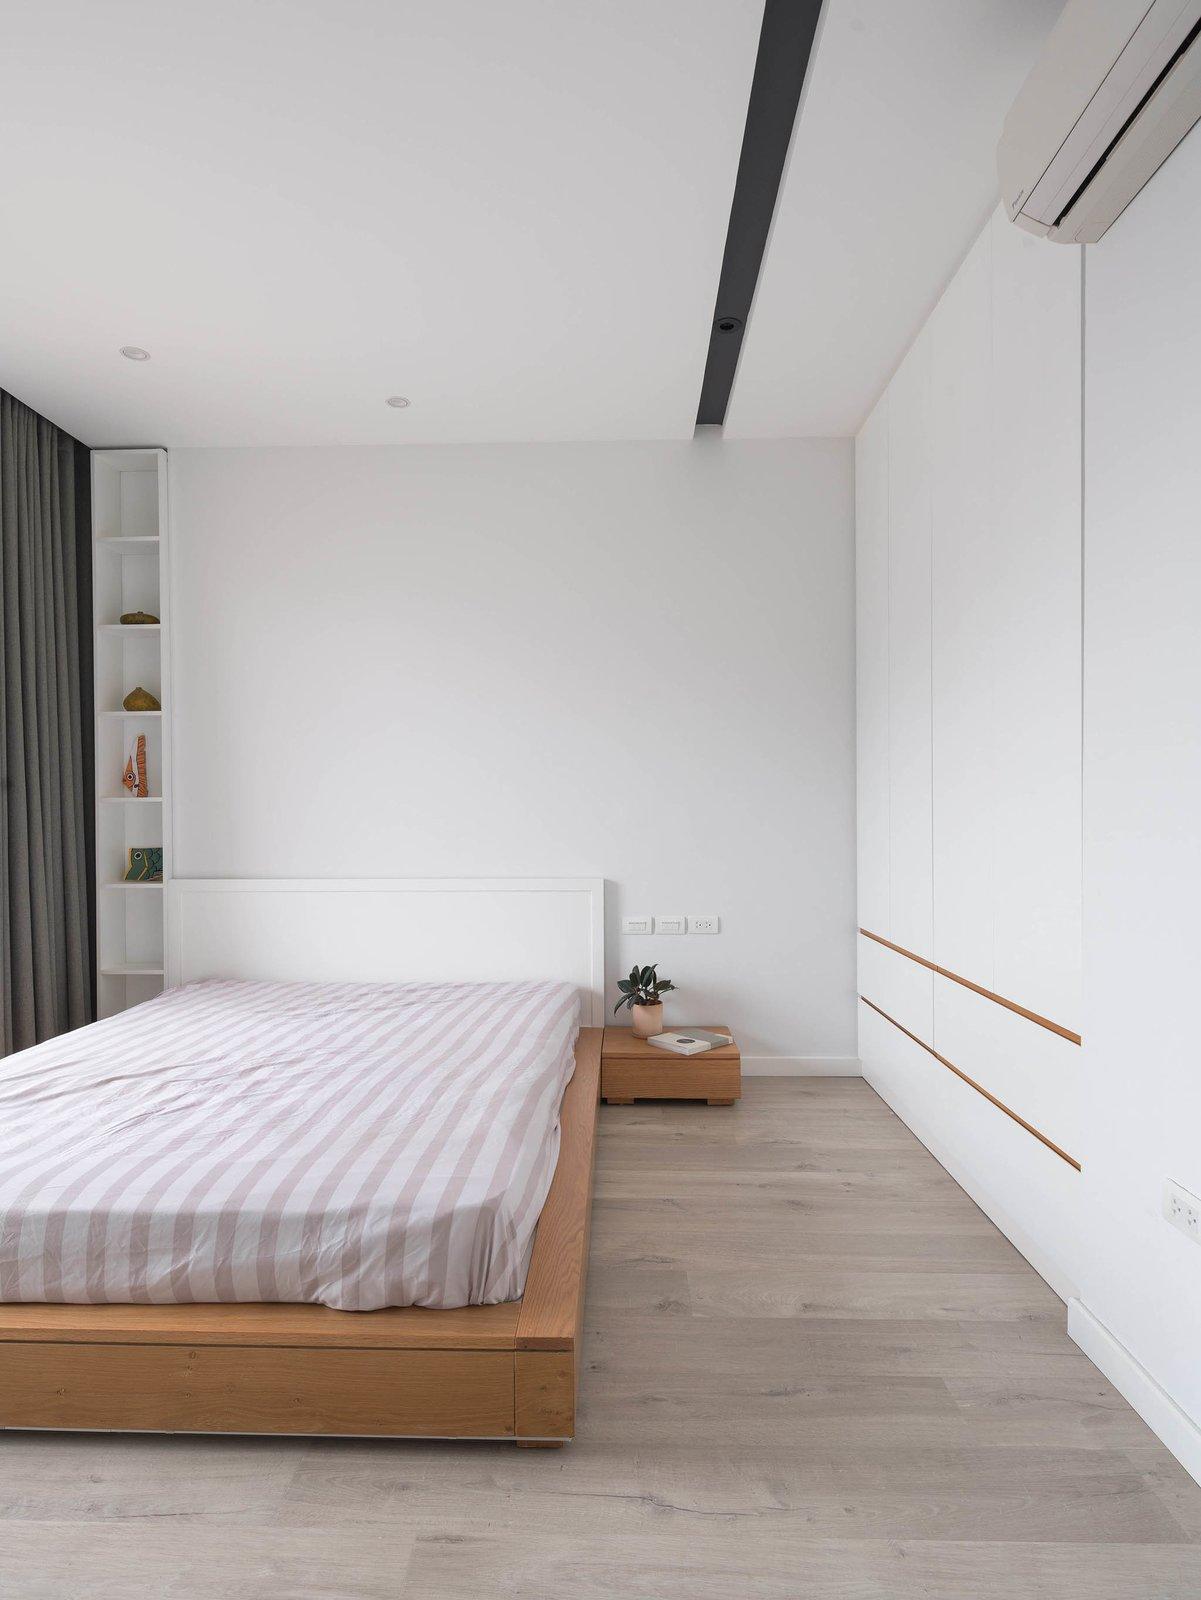 Bedroom, Wardrobe, Ceiling Lighting, Bed, and Light Hardwood Floor bedroom  Best Photos from A.D02